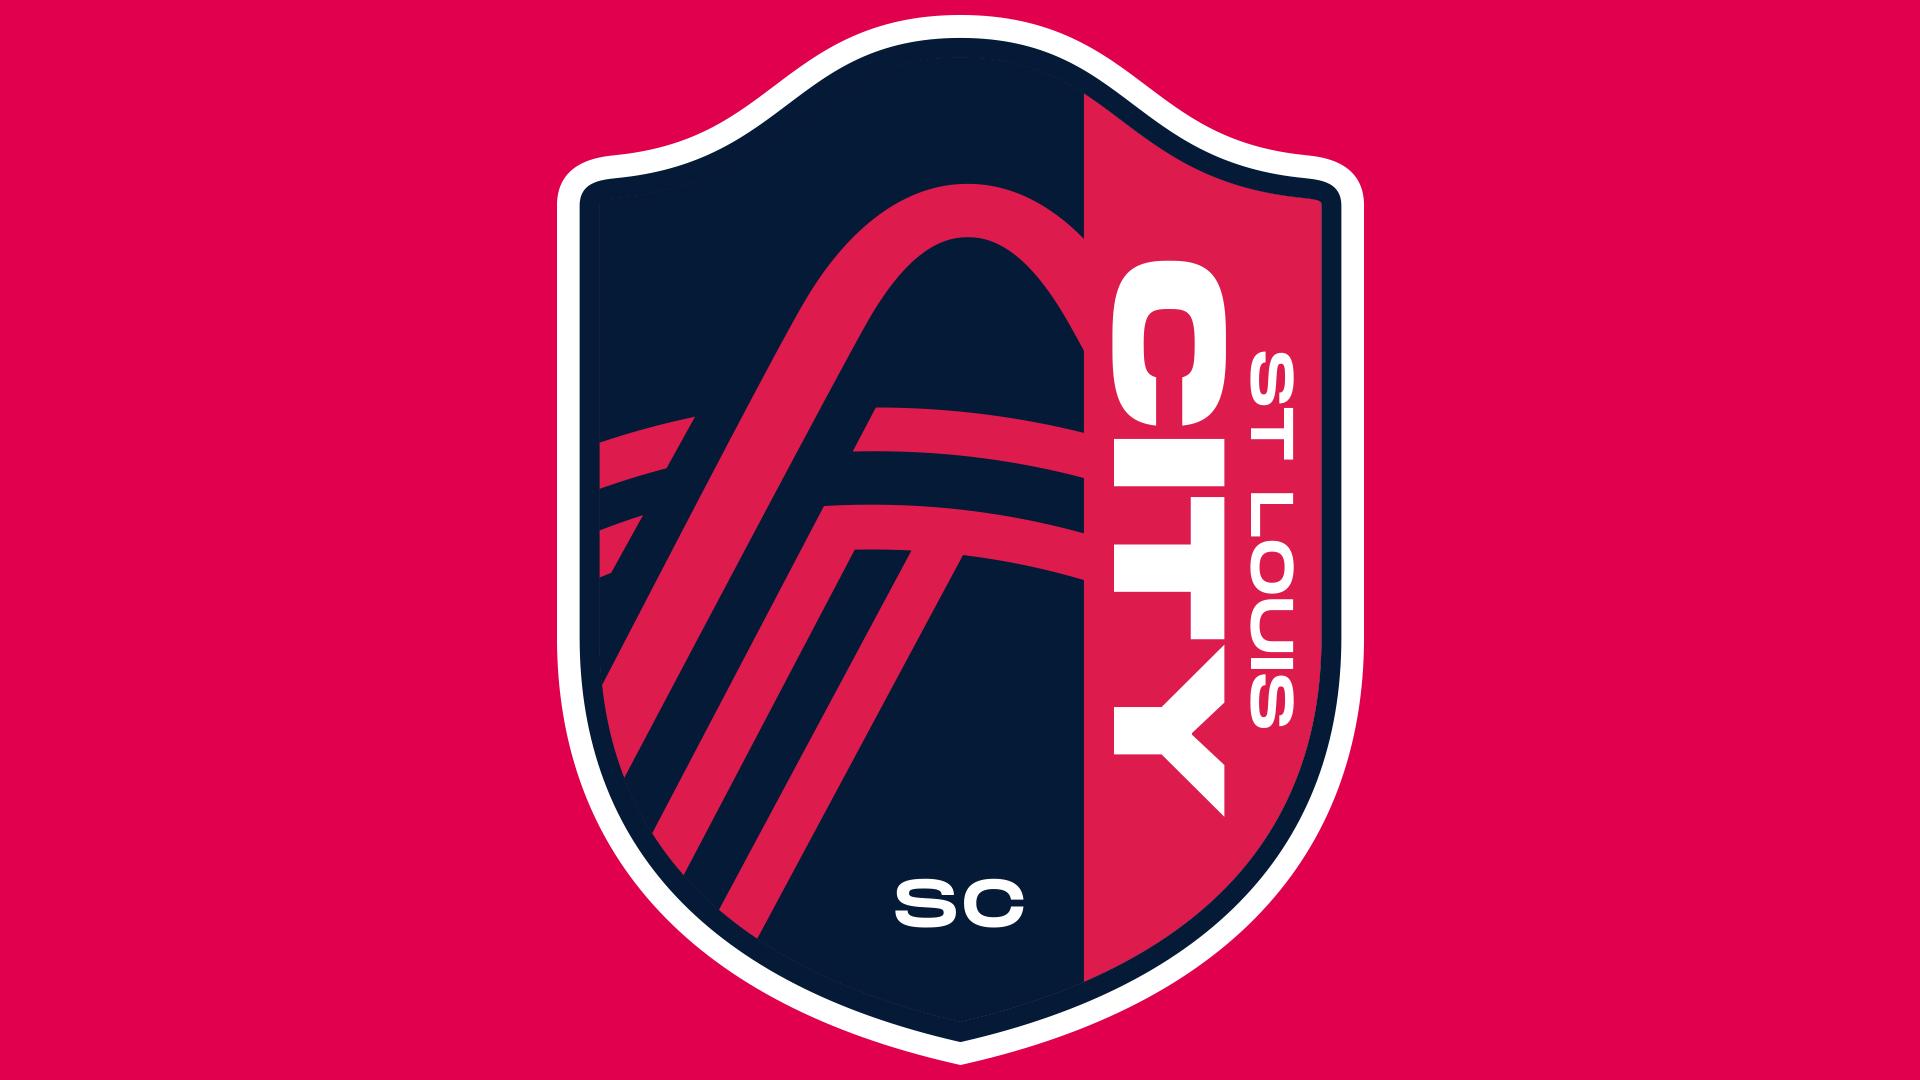 stl-city-sc-0